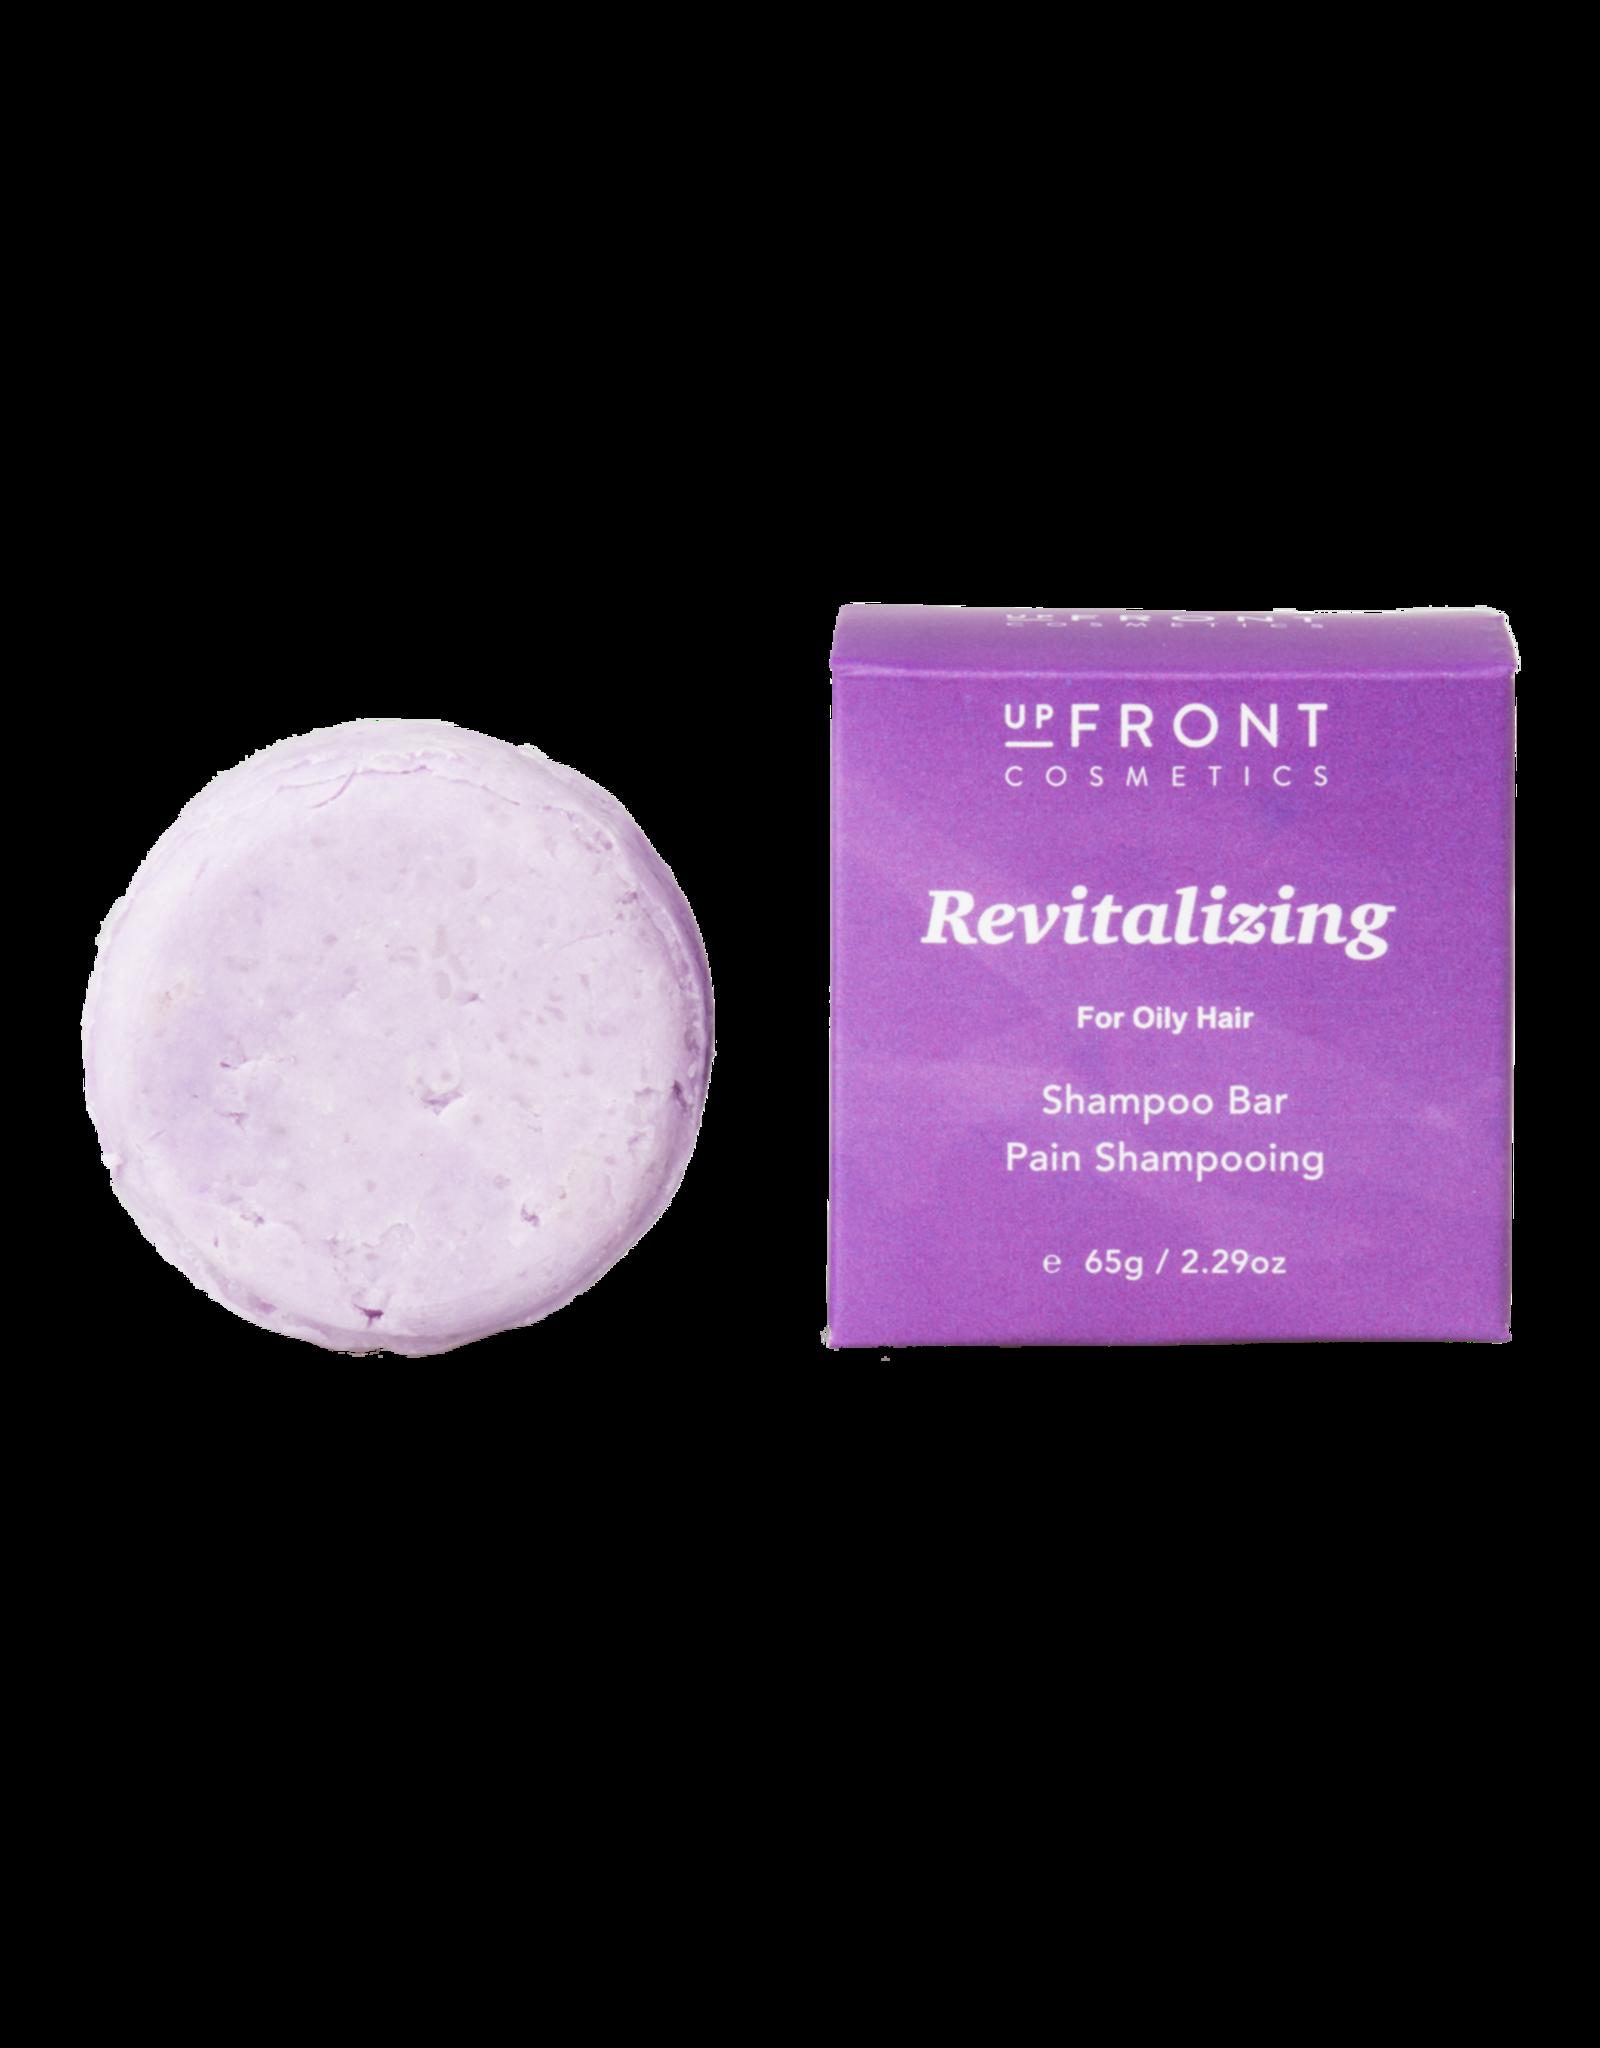 Upfront Cosmetics Shampoo Bar by Upfront Cosmetics